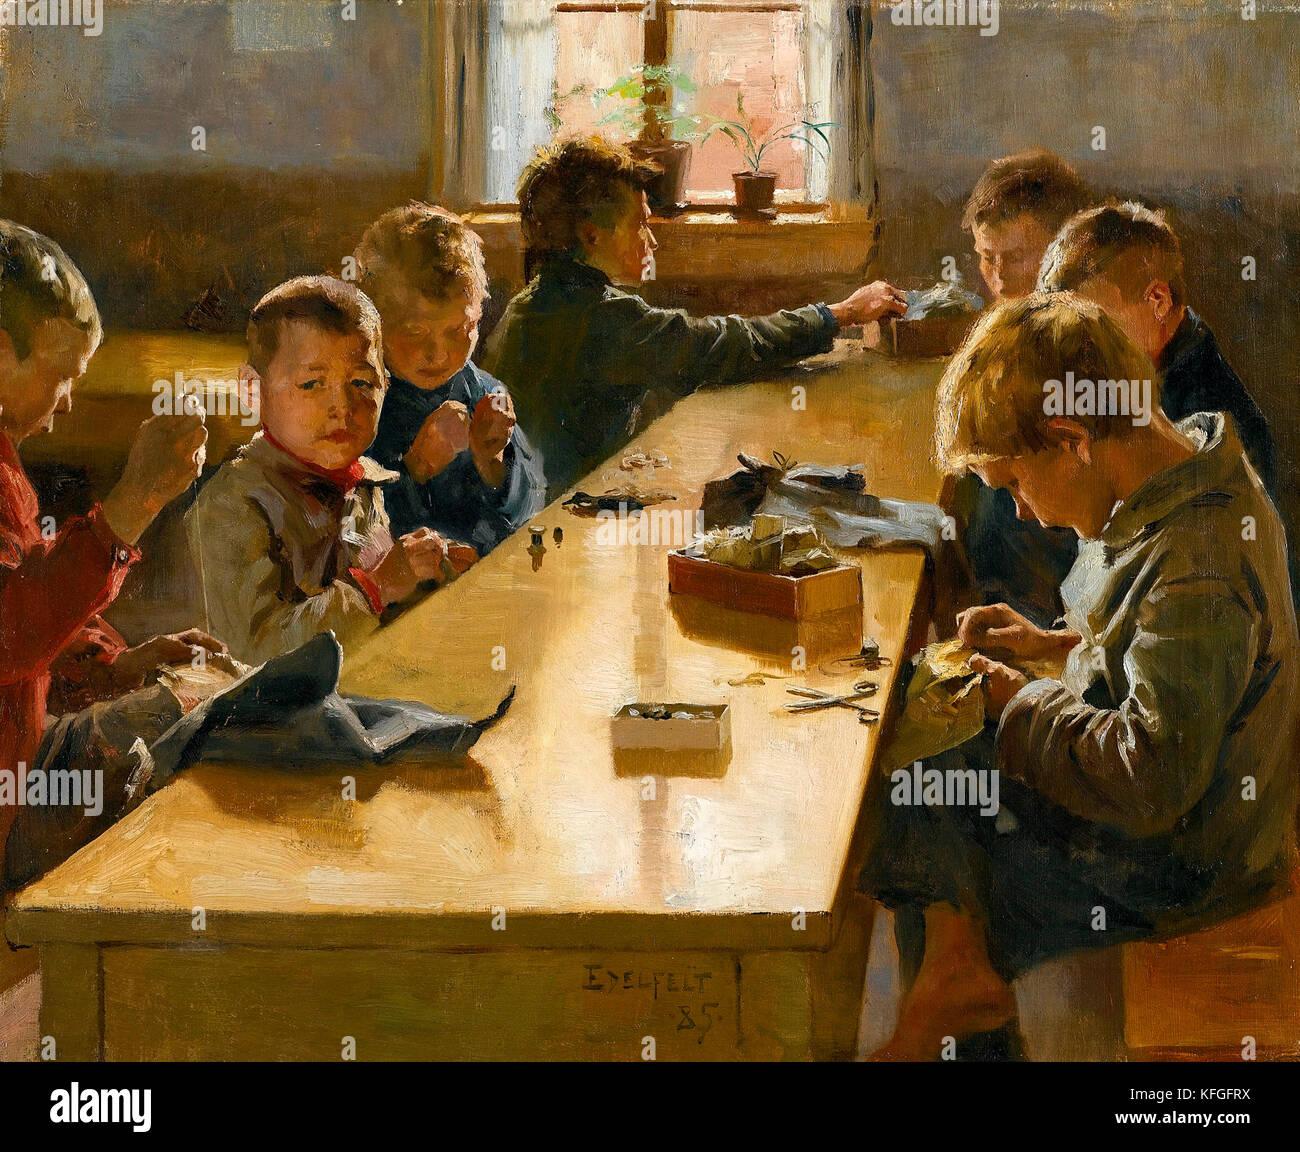 """The Boys' Workhouse"" by Albert Edelfelt (1885) Stock Photo"